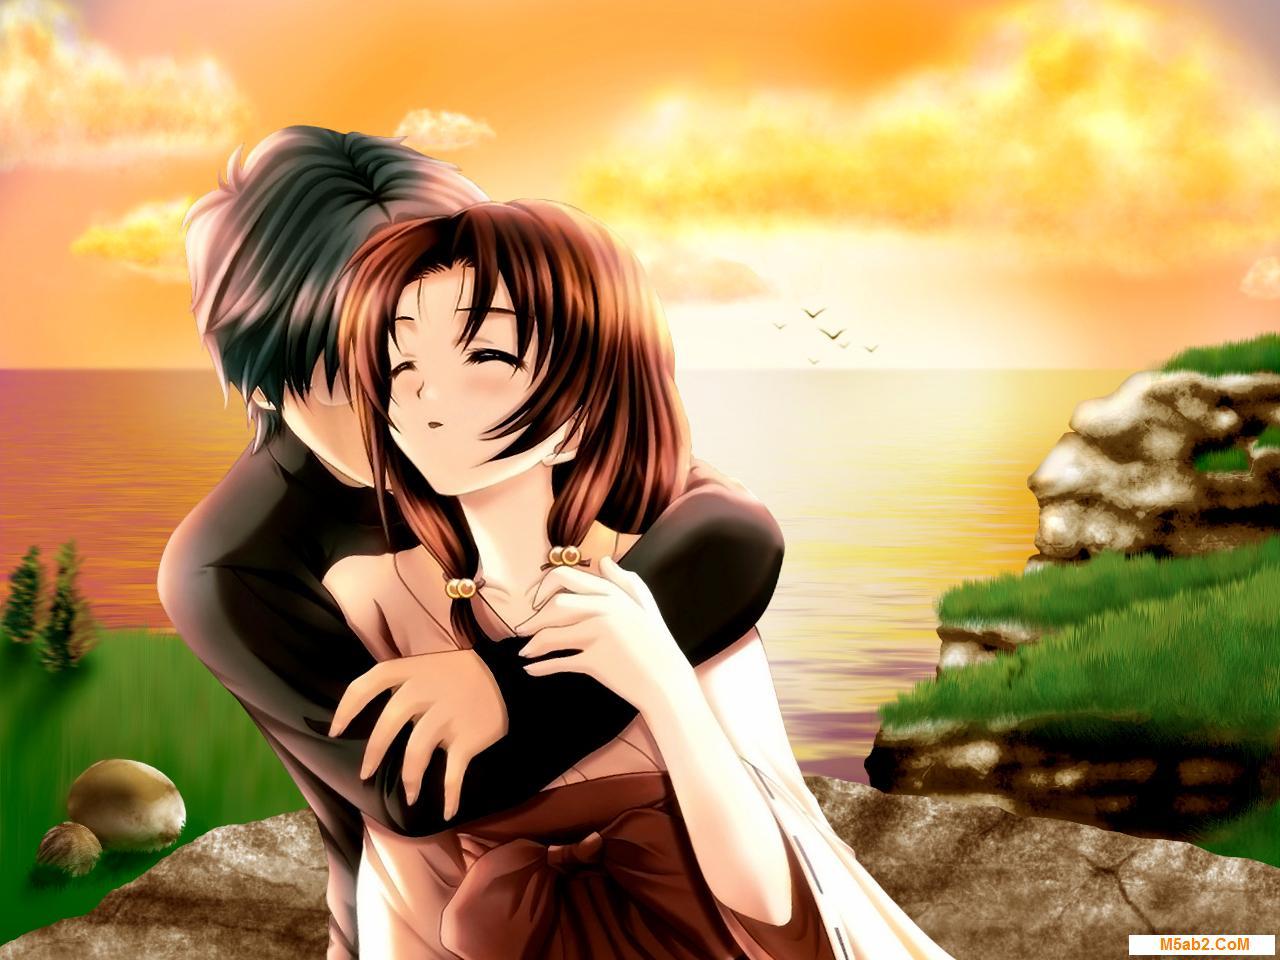 Anime Romance Photos - Romantic Cartoon Pictures